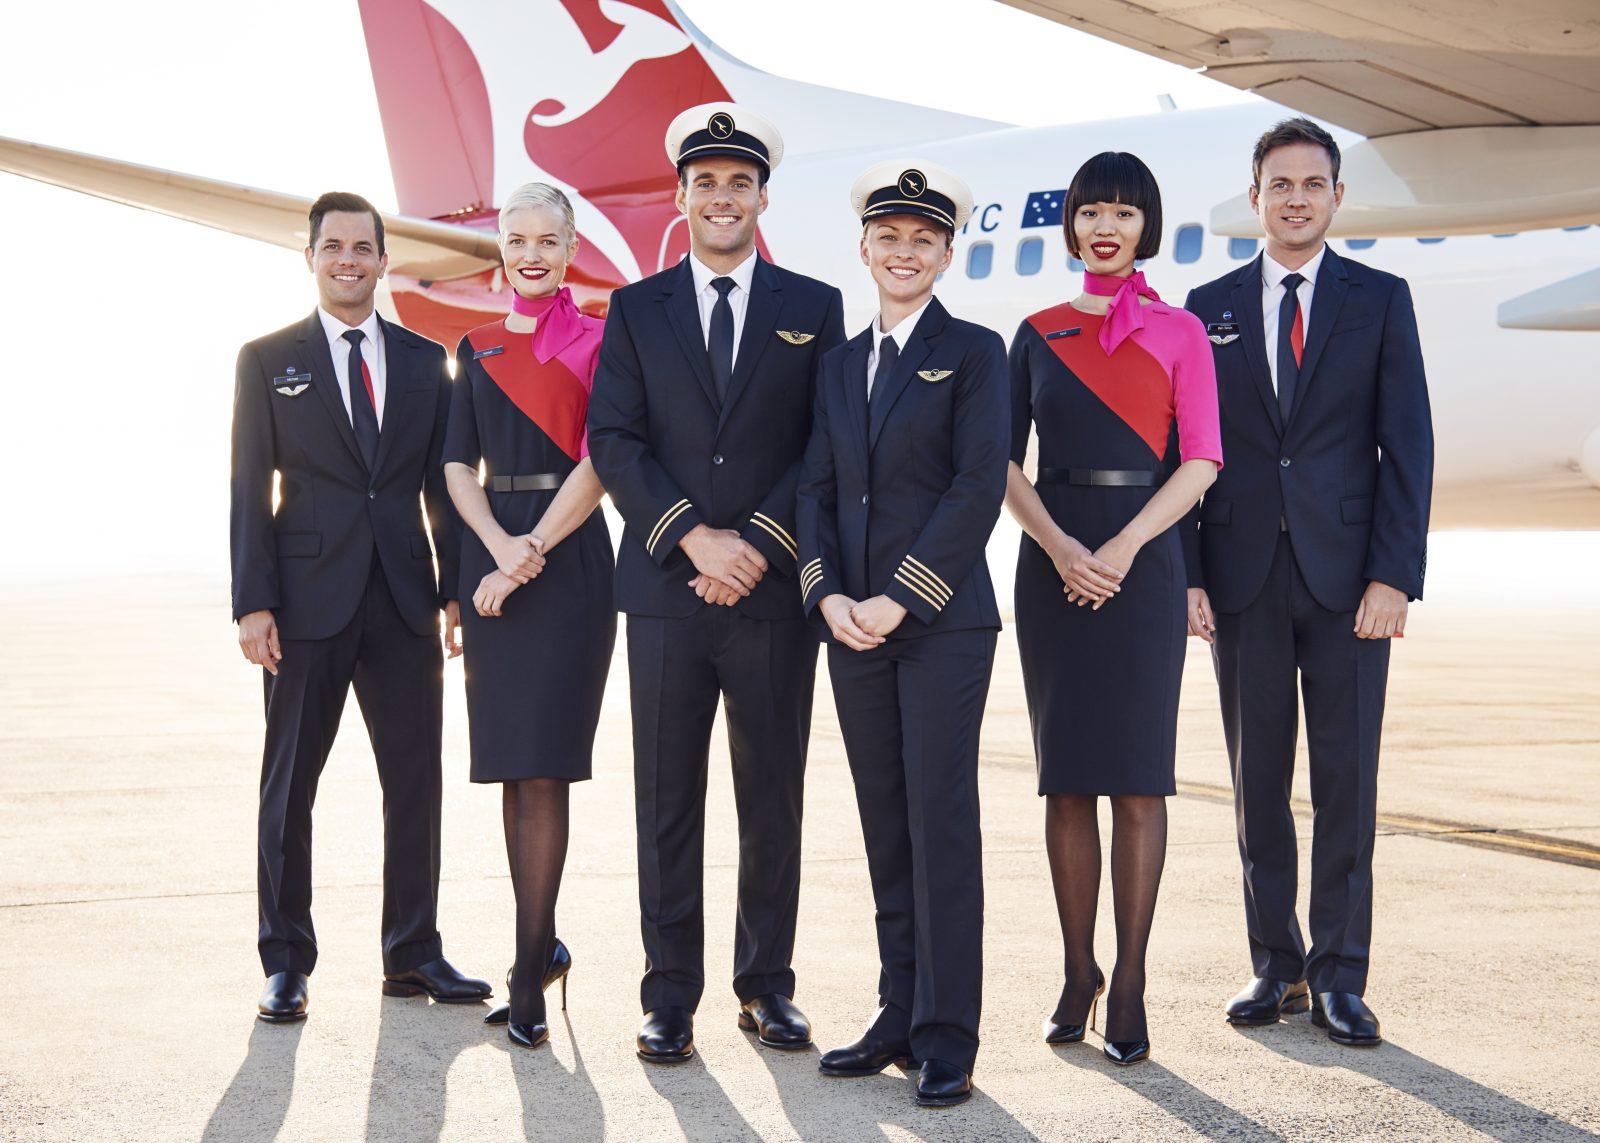 To show Qantas crew